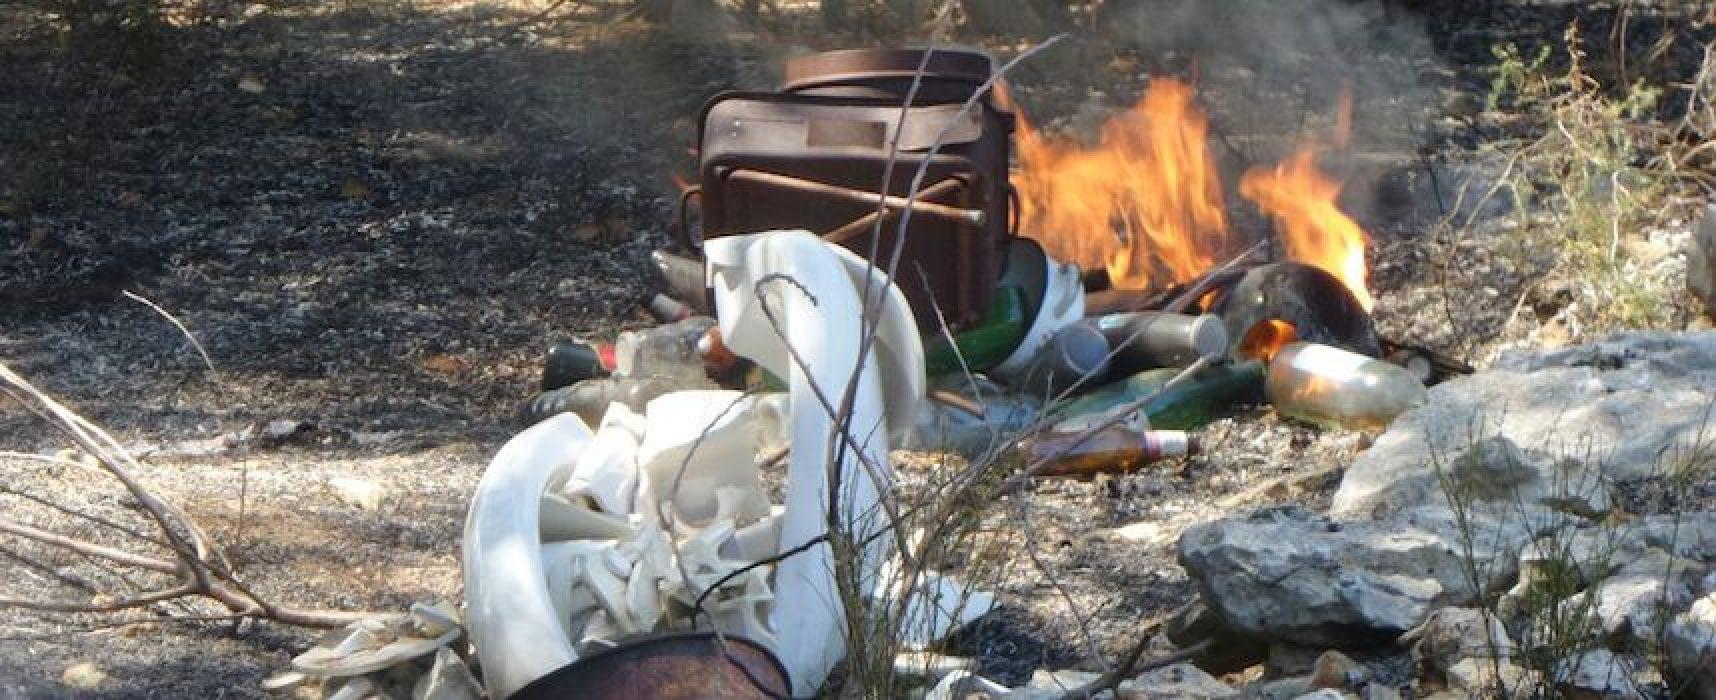 Due incendi nell'agro biscegliese, in fiamme anche cumuli di immondizia